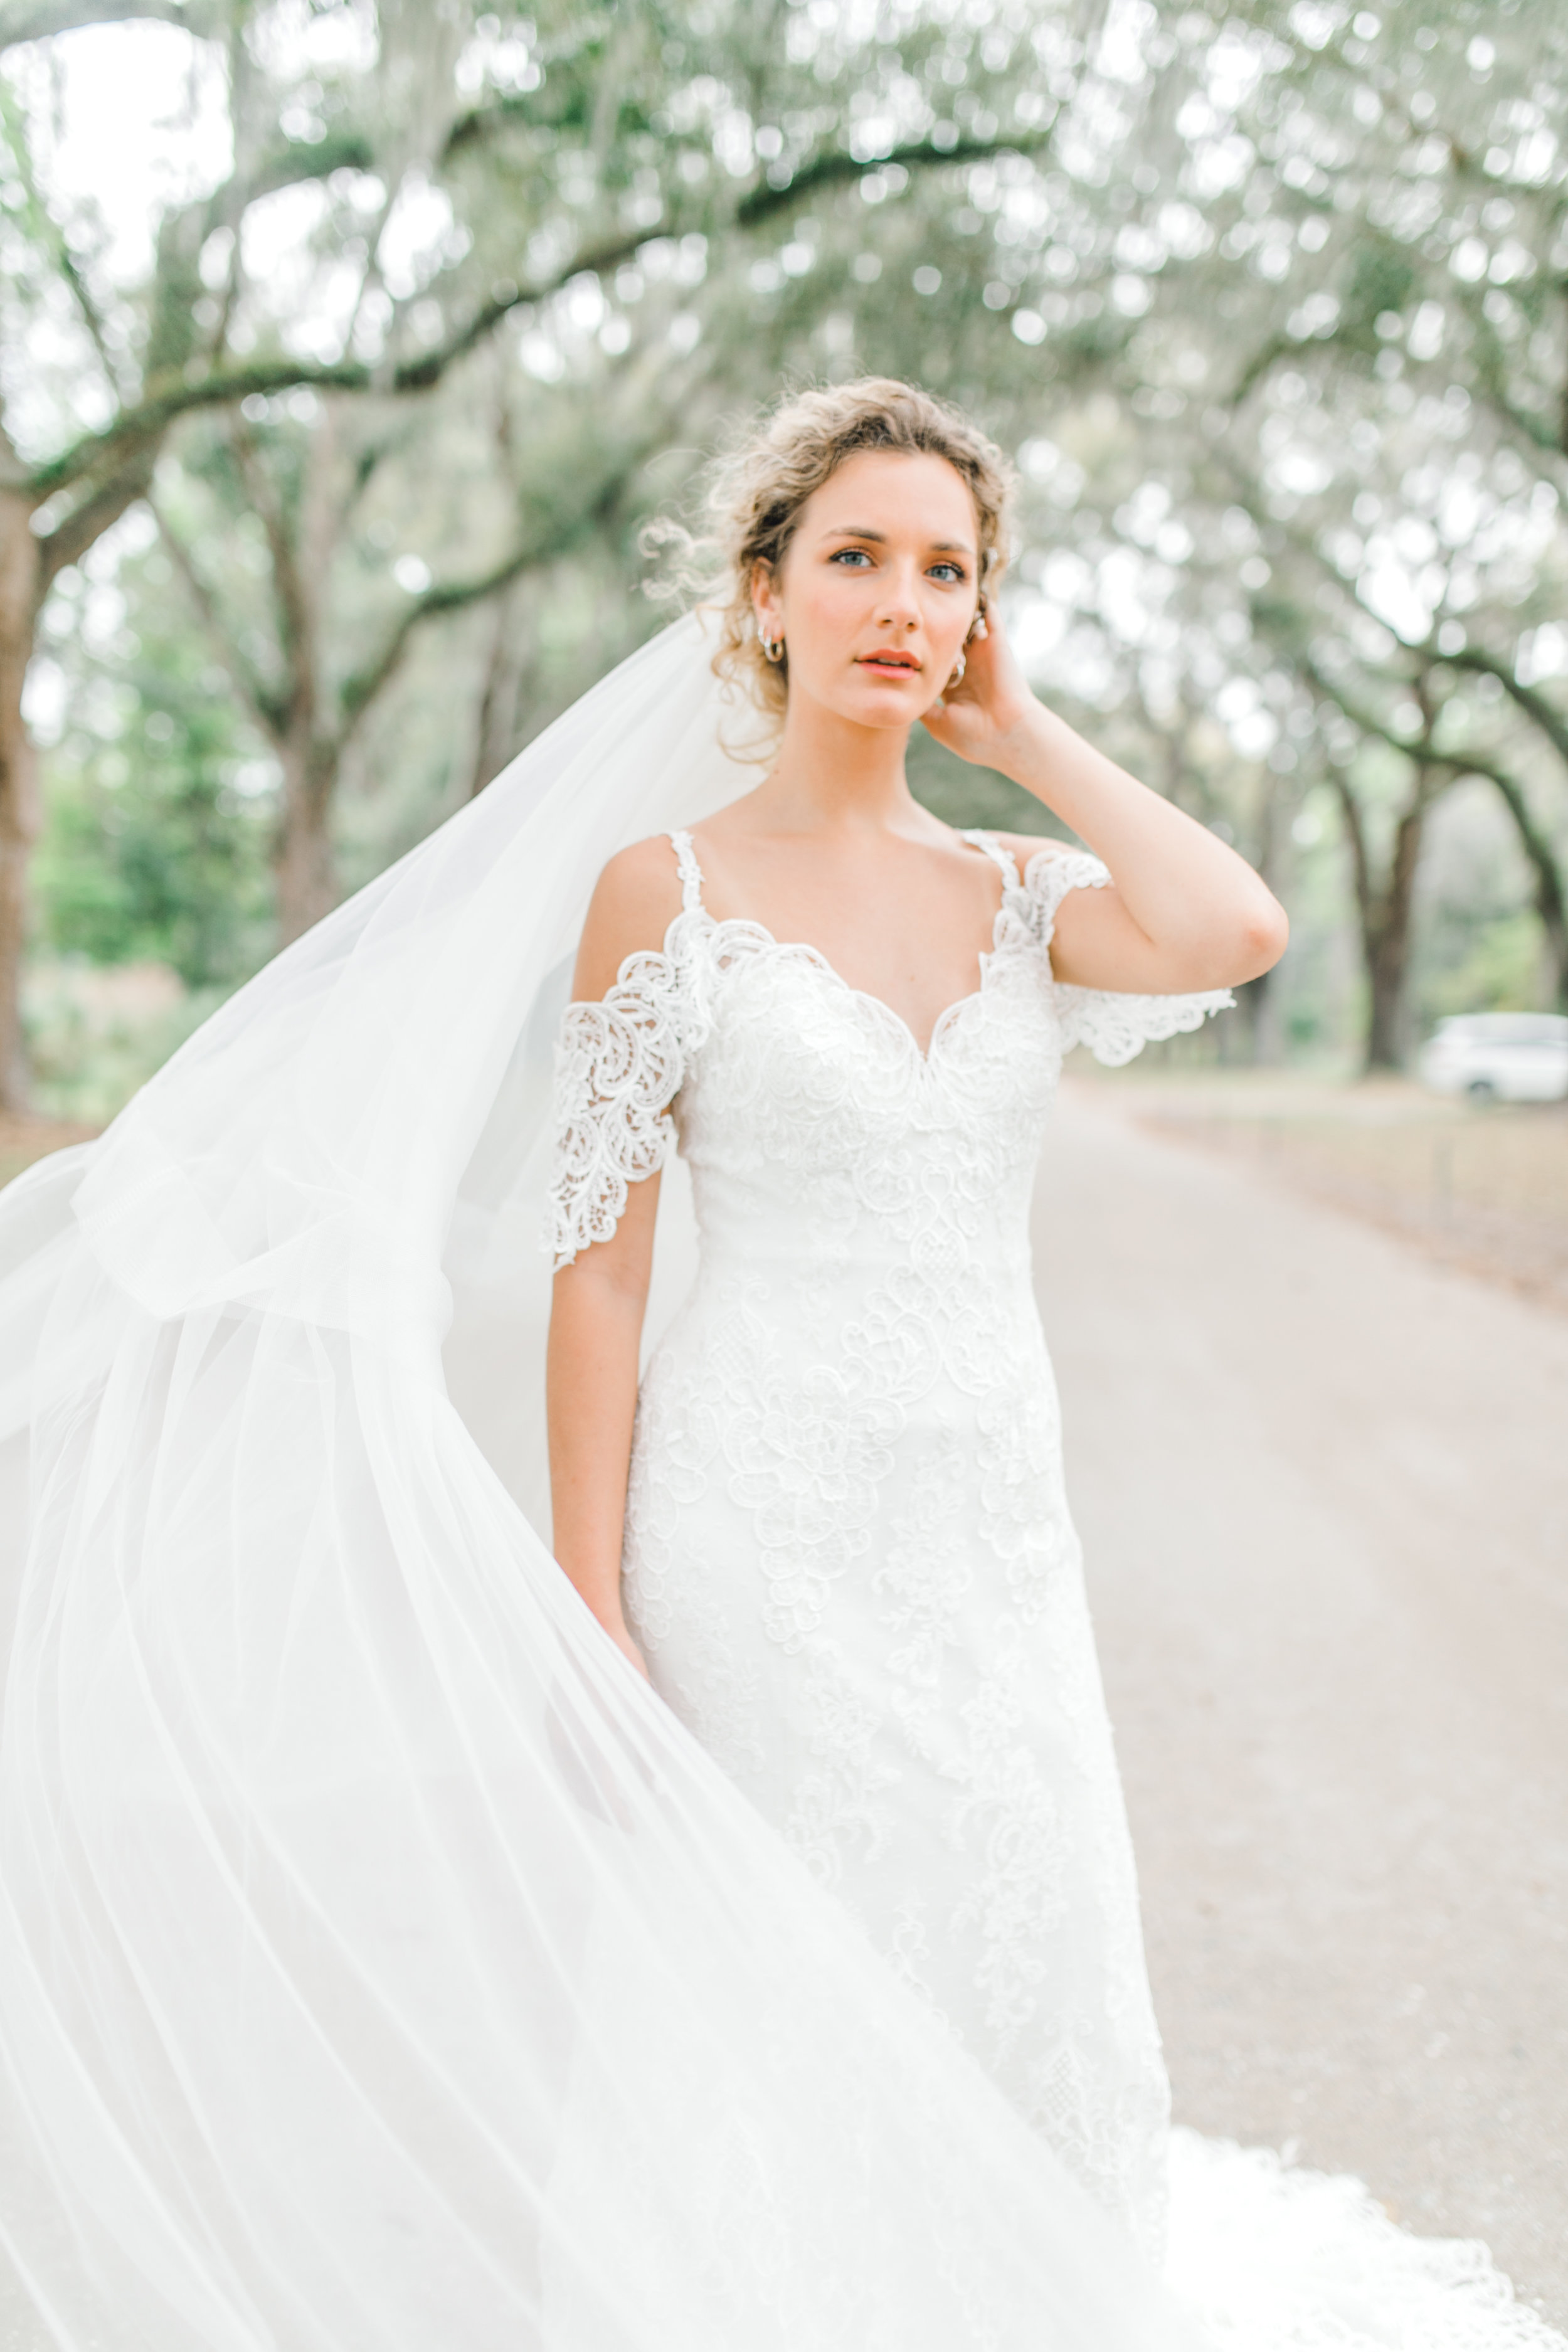 maggie-sottero-elliana-selycia-yang-photography-savannah-wedding-dresses-savannah-bridal-boutique-off-the-shoulder-wedding-dress-maggie-sottero-bride-wormsloe-wedding-inspiration-wormsloe-elopement-wormsloe-historic-park.jpg